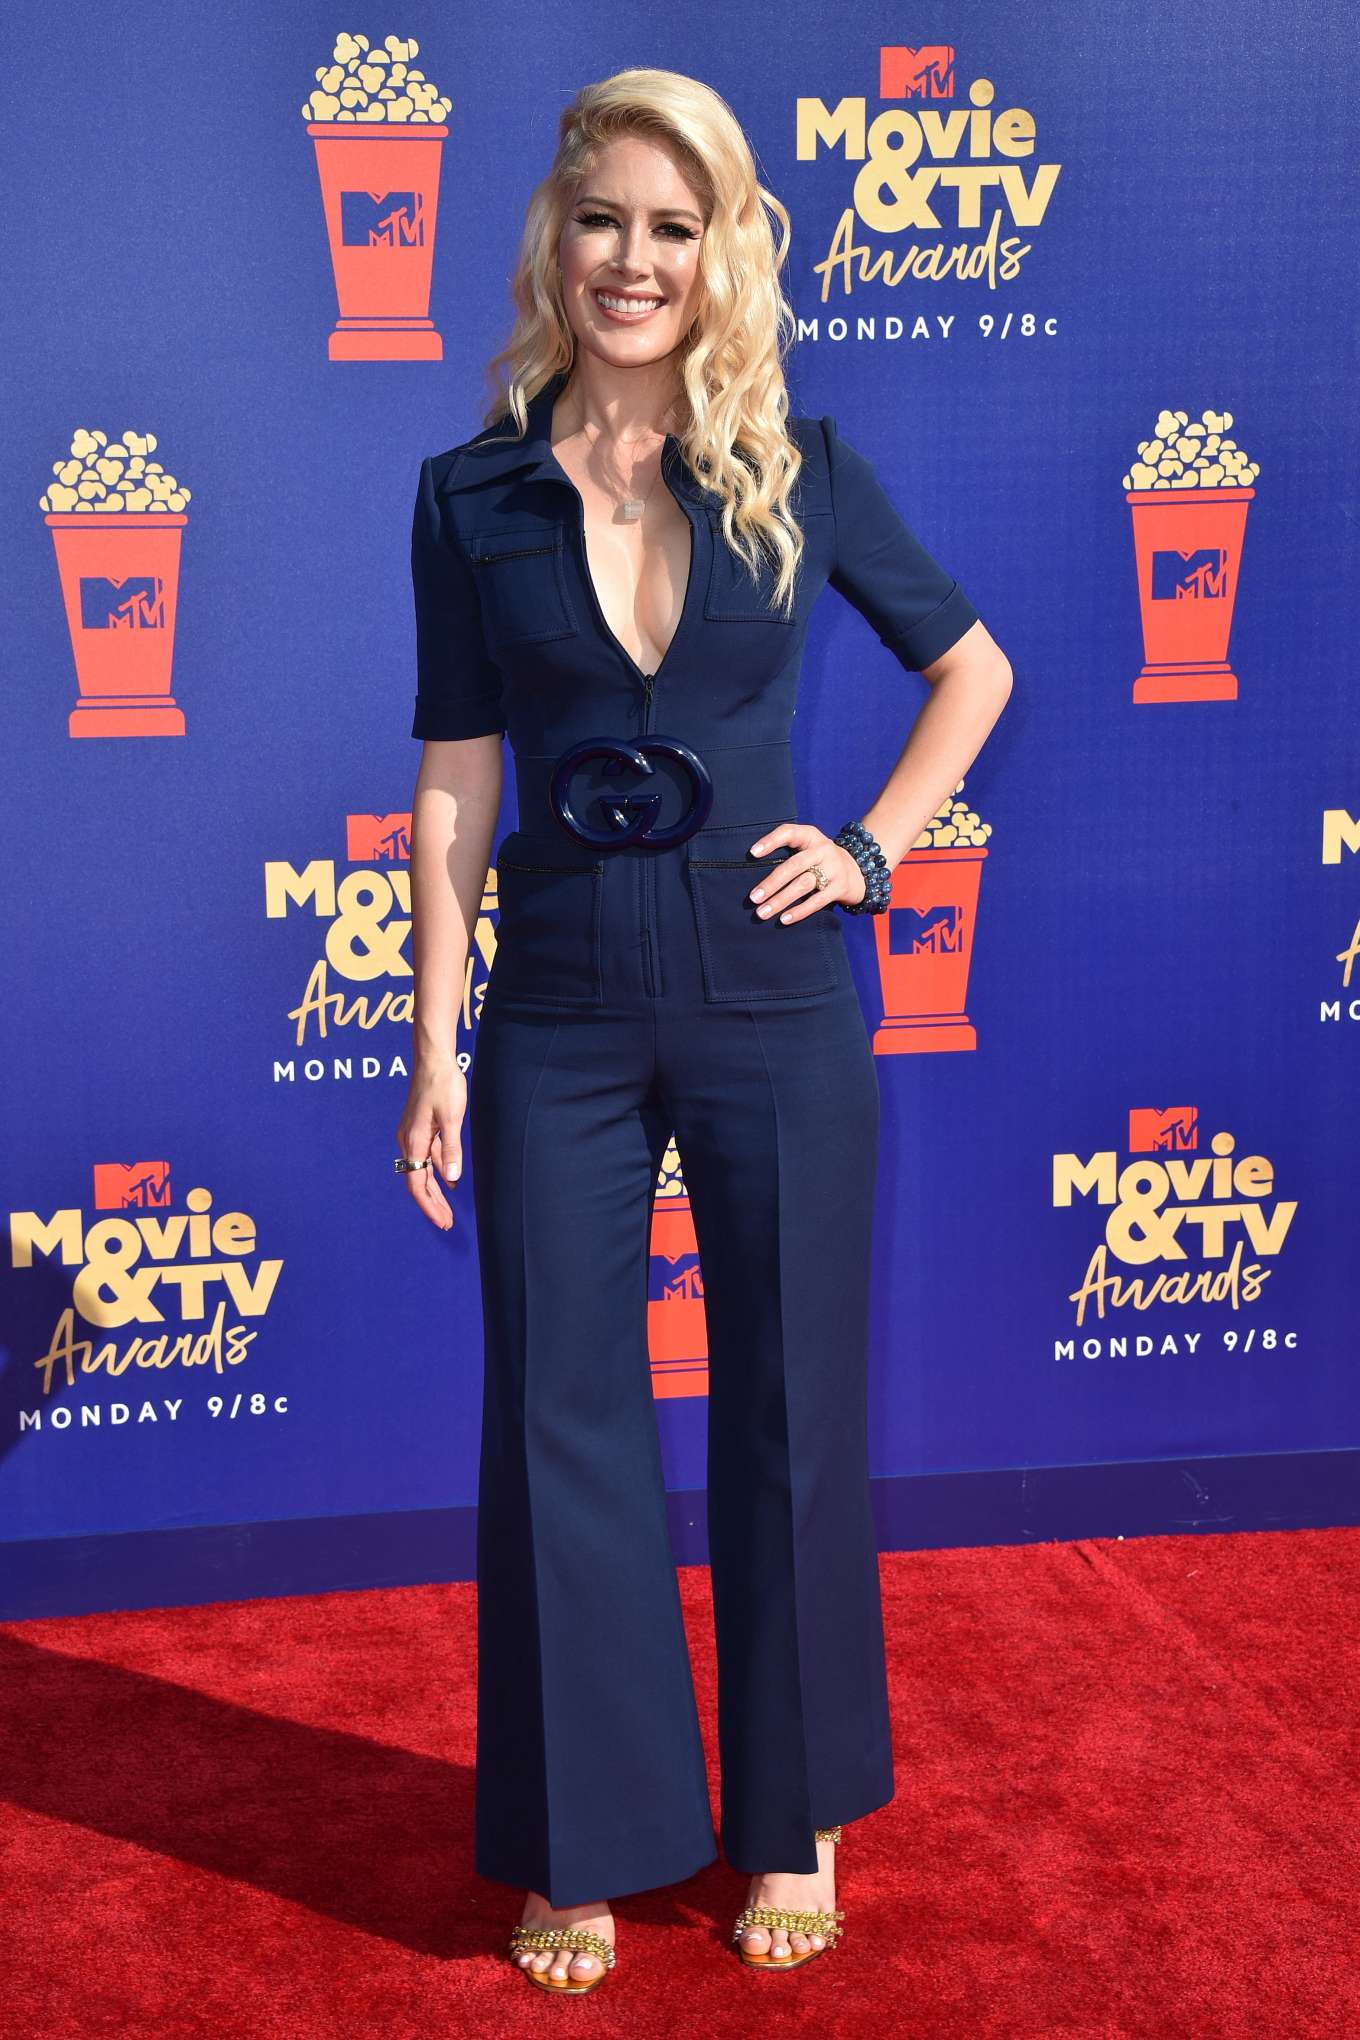 Heidi Montag 2019 : Heidi Montag: 2019 MTV Movie and TV Awards Red Carpet-03